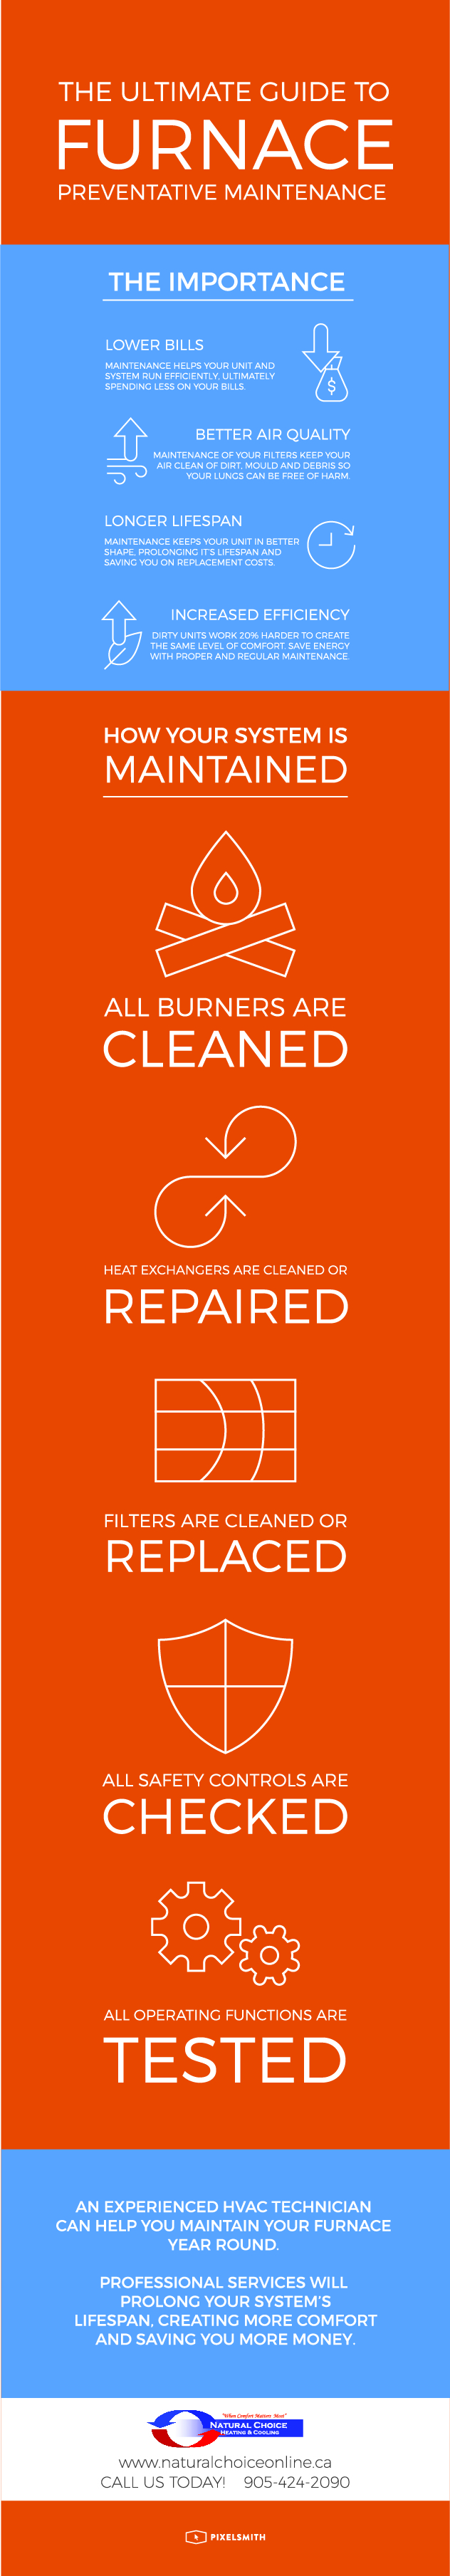 furnace preventative maintenance infographic